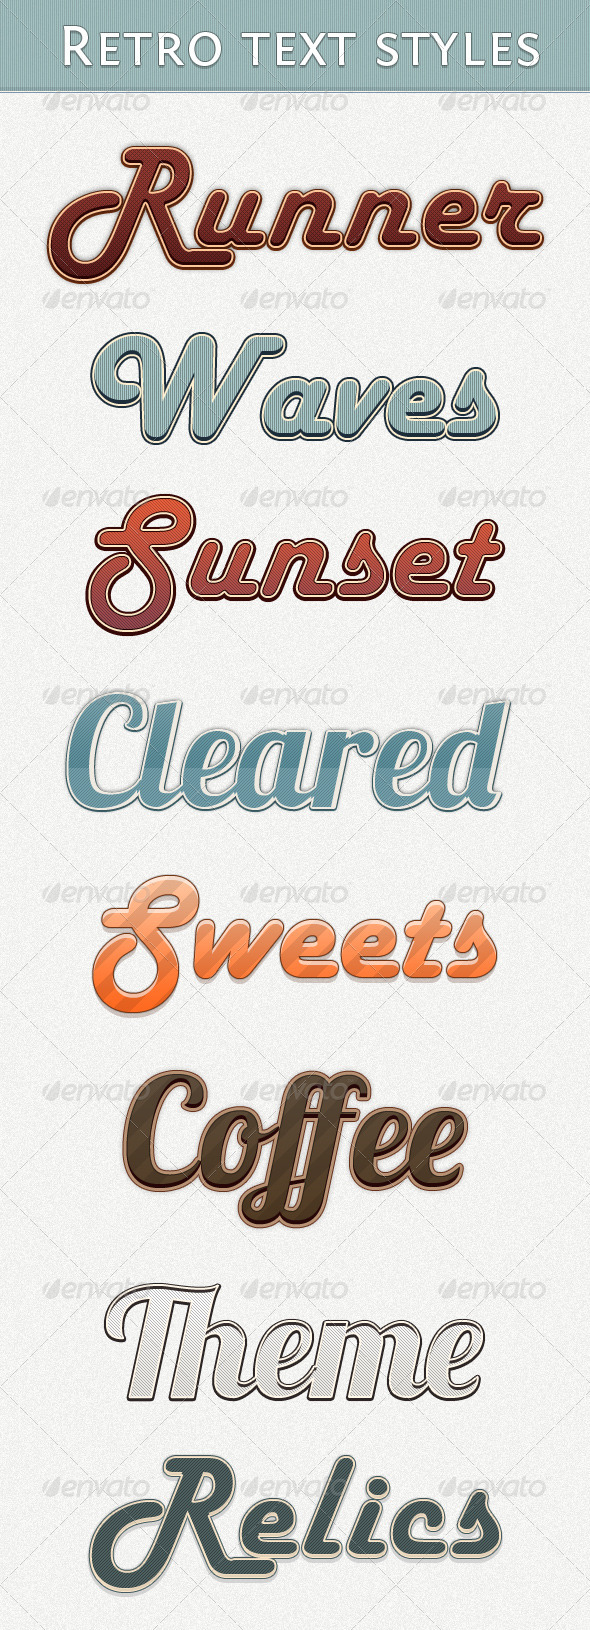 GraphicRiver Retro Text Styles 1681829